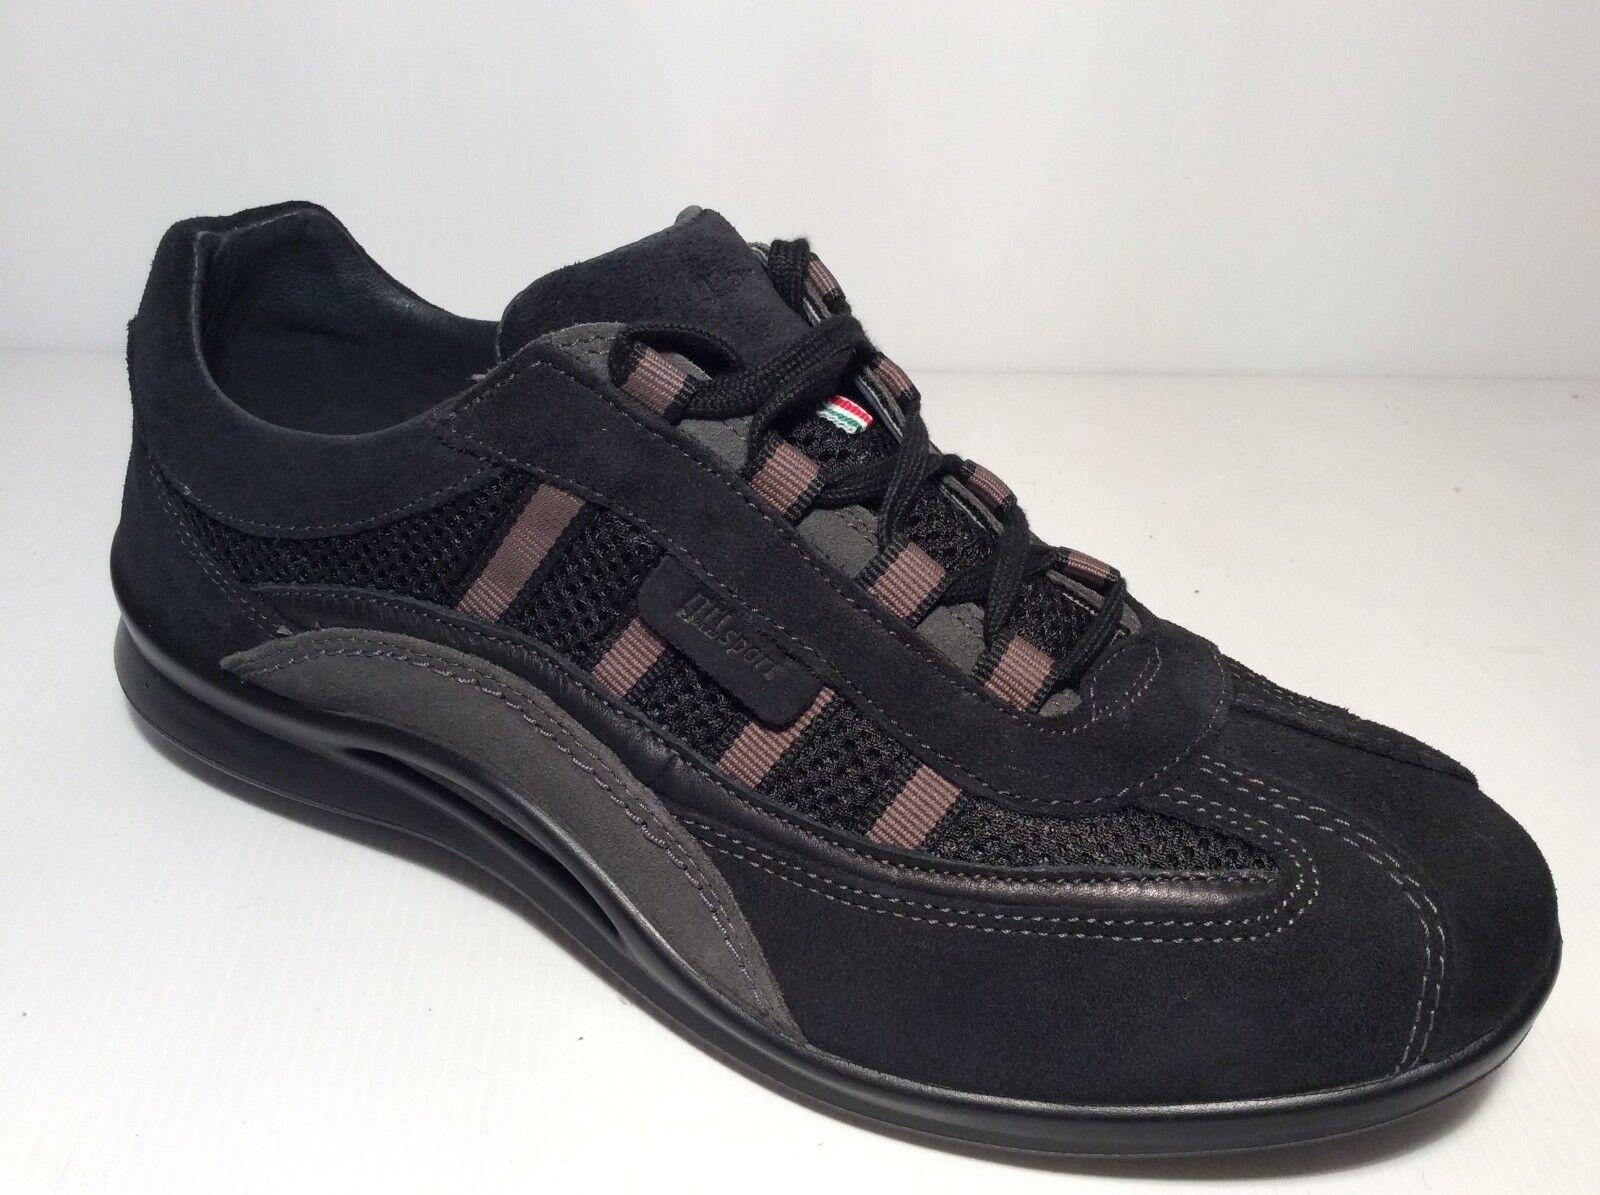 schuhe grauPORT IN CAMOSCIO herren LACCI ART 8409 COL schwarz schwarz schwarz  Made in  f027e6